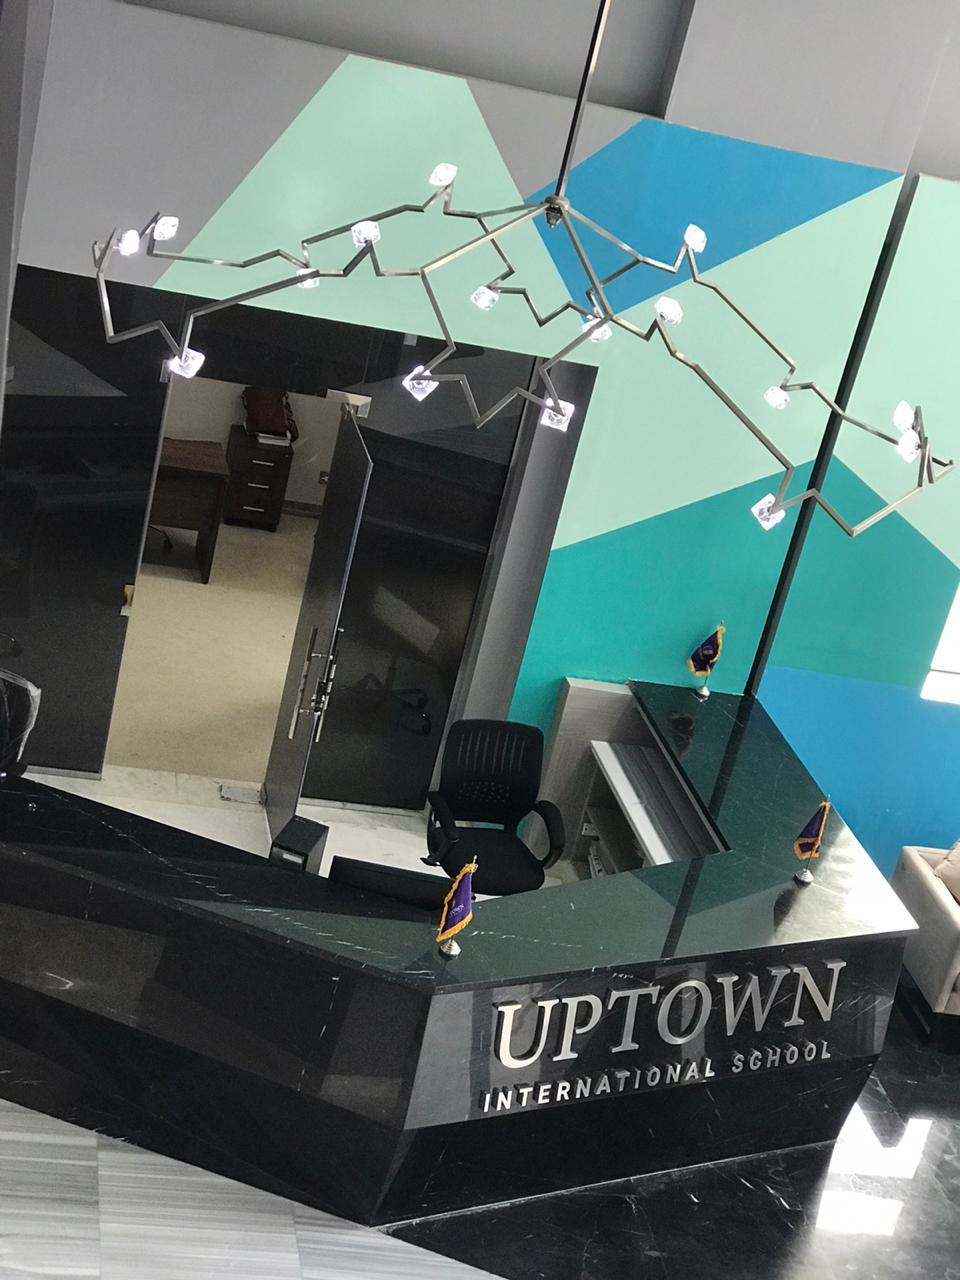 Uptown international school